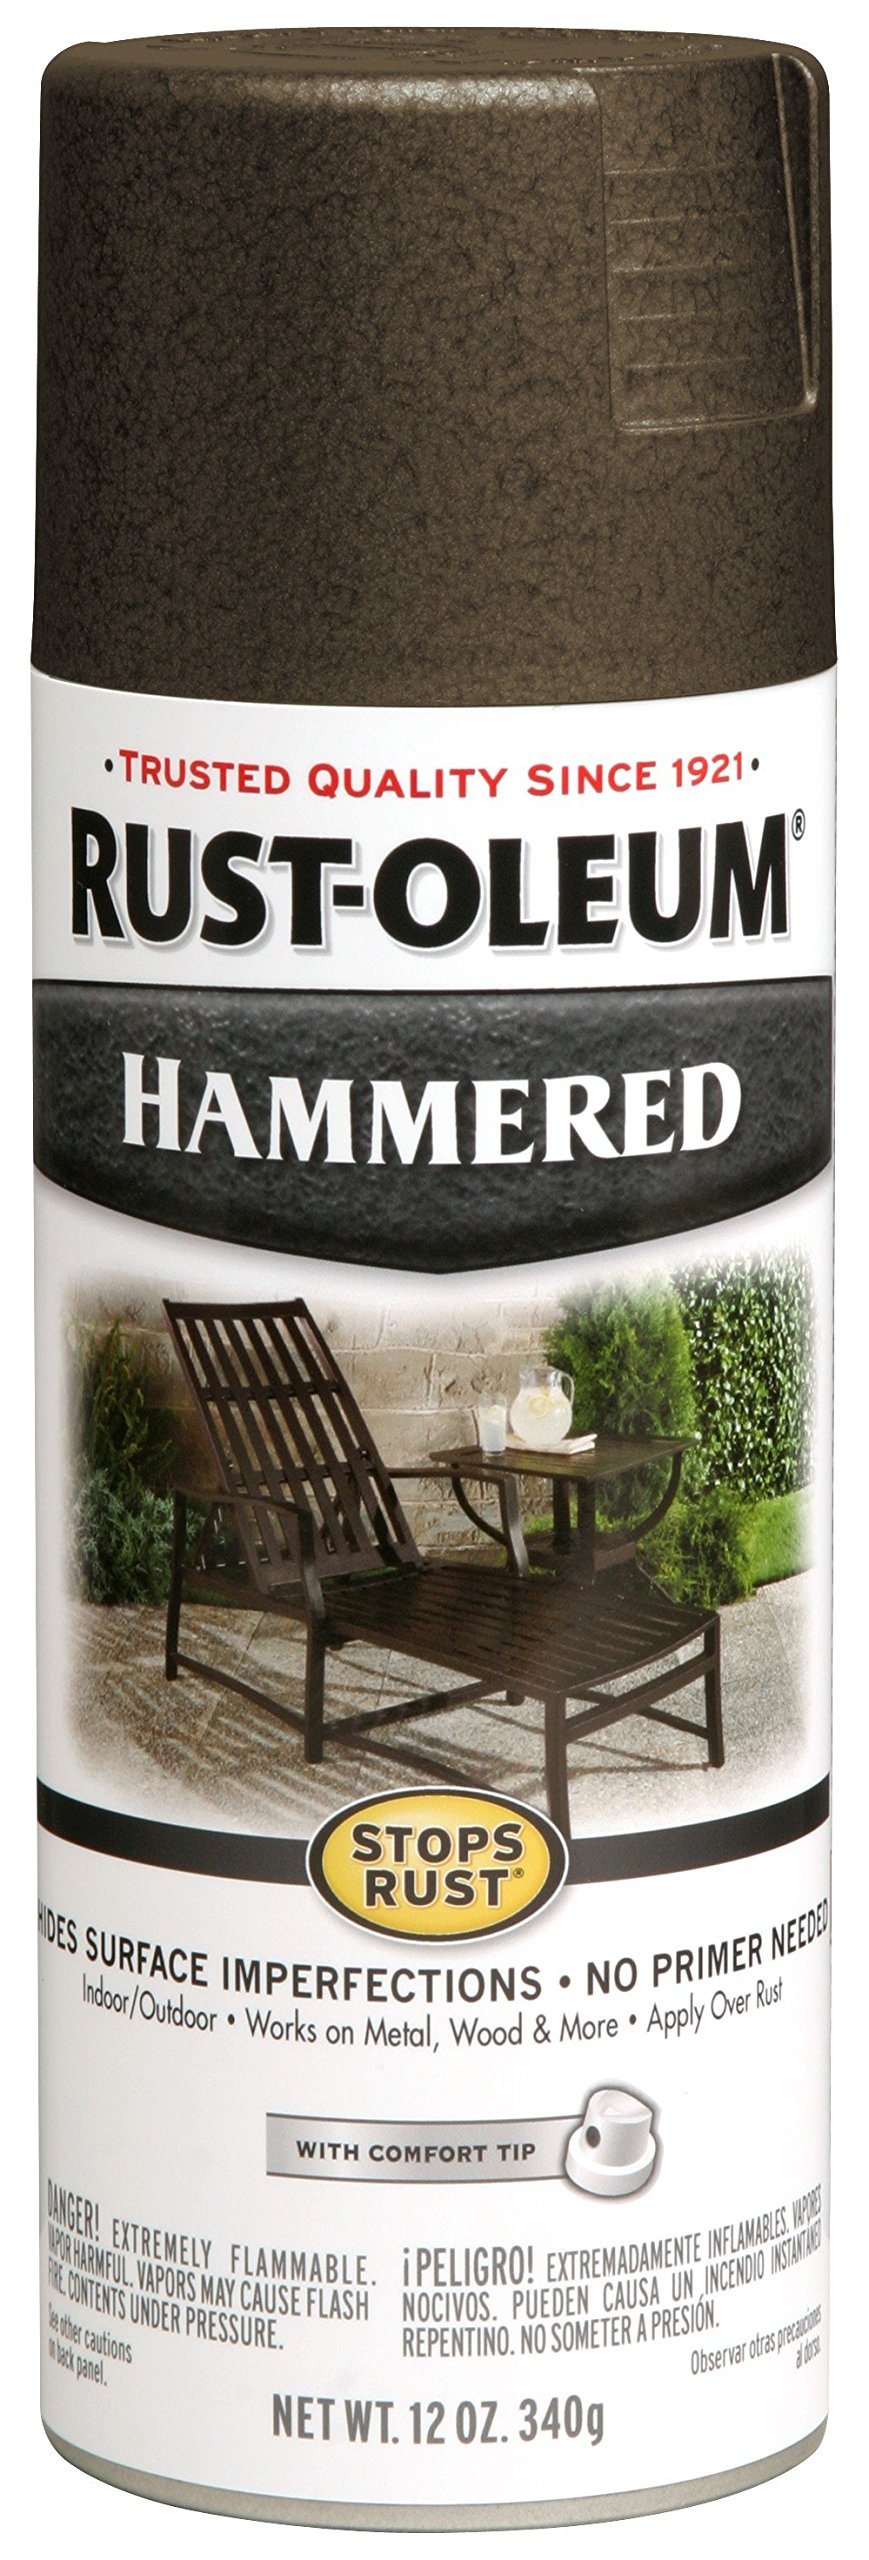 Rust-Oleum 7218830-6 PK Stops Hammered Finish Spray Paint, 6 Pack, Dark Bronze